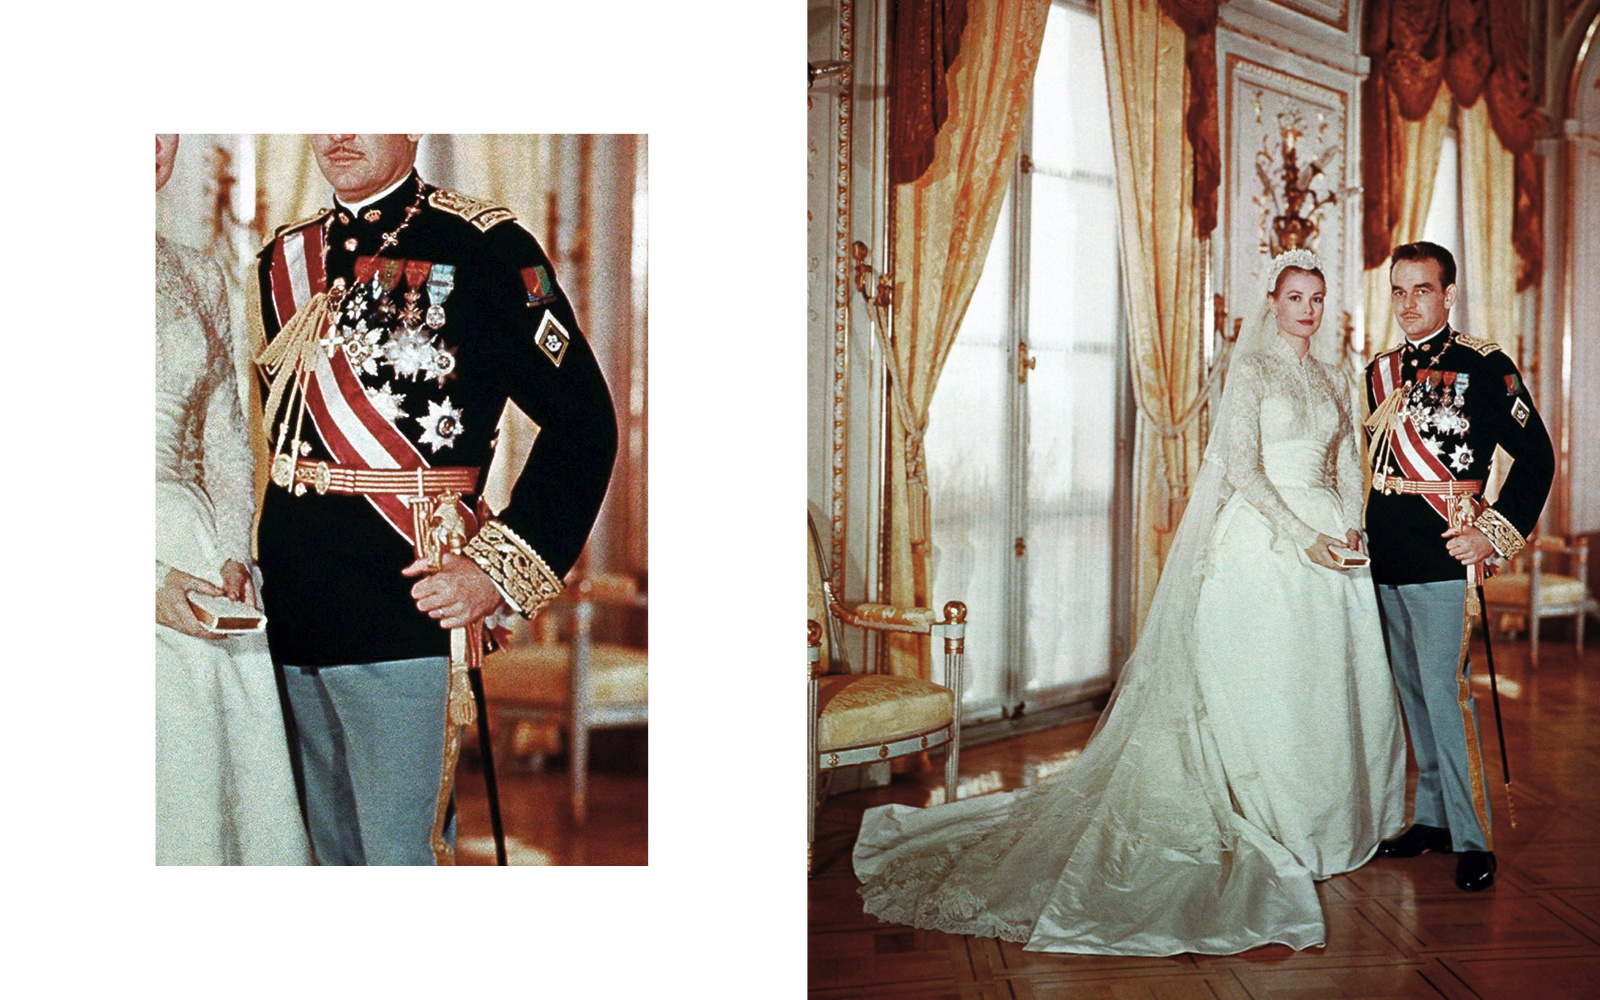 Prince Rainier III